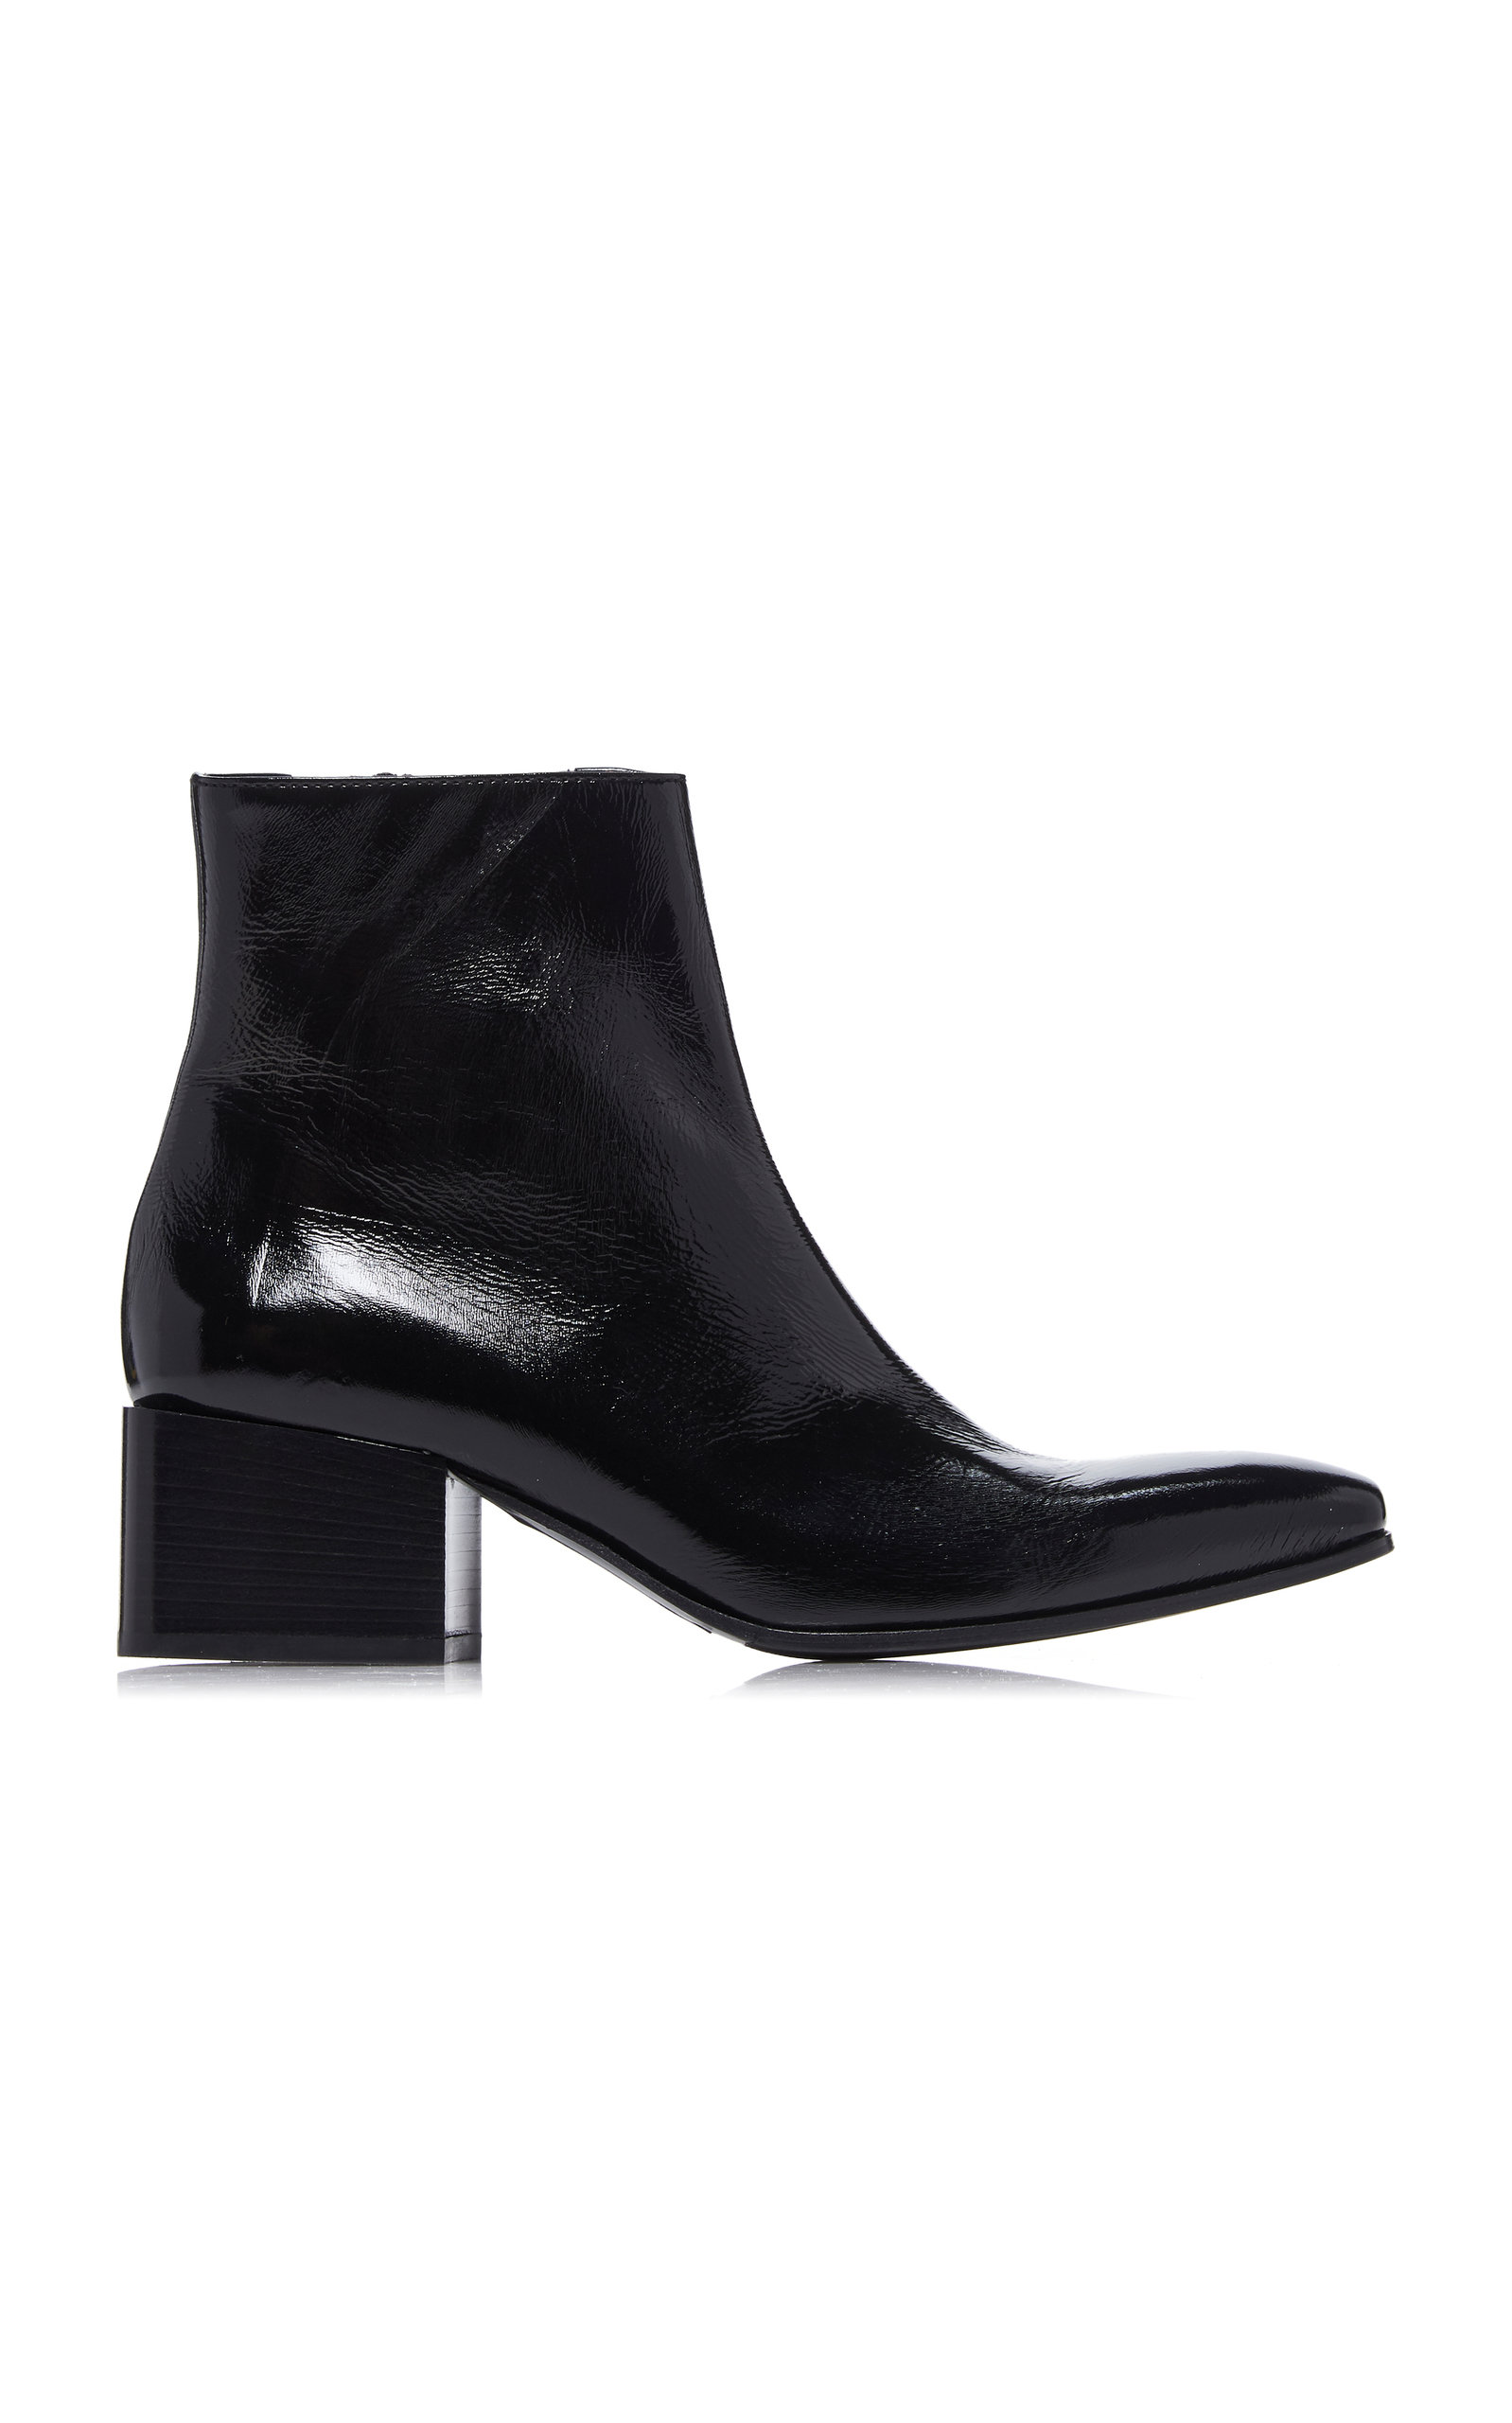 d24309e60aa36 Birgit Patent Leather Boots by Acne Studios   Moda Operandi